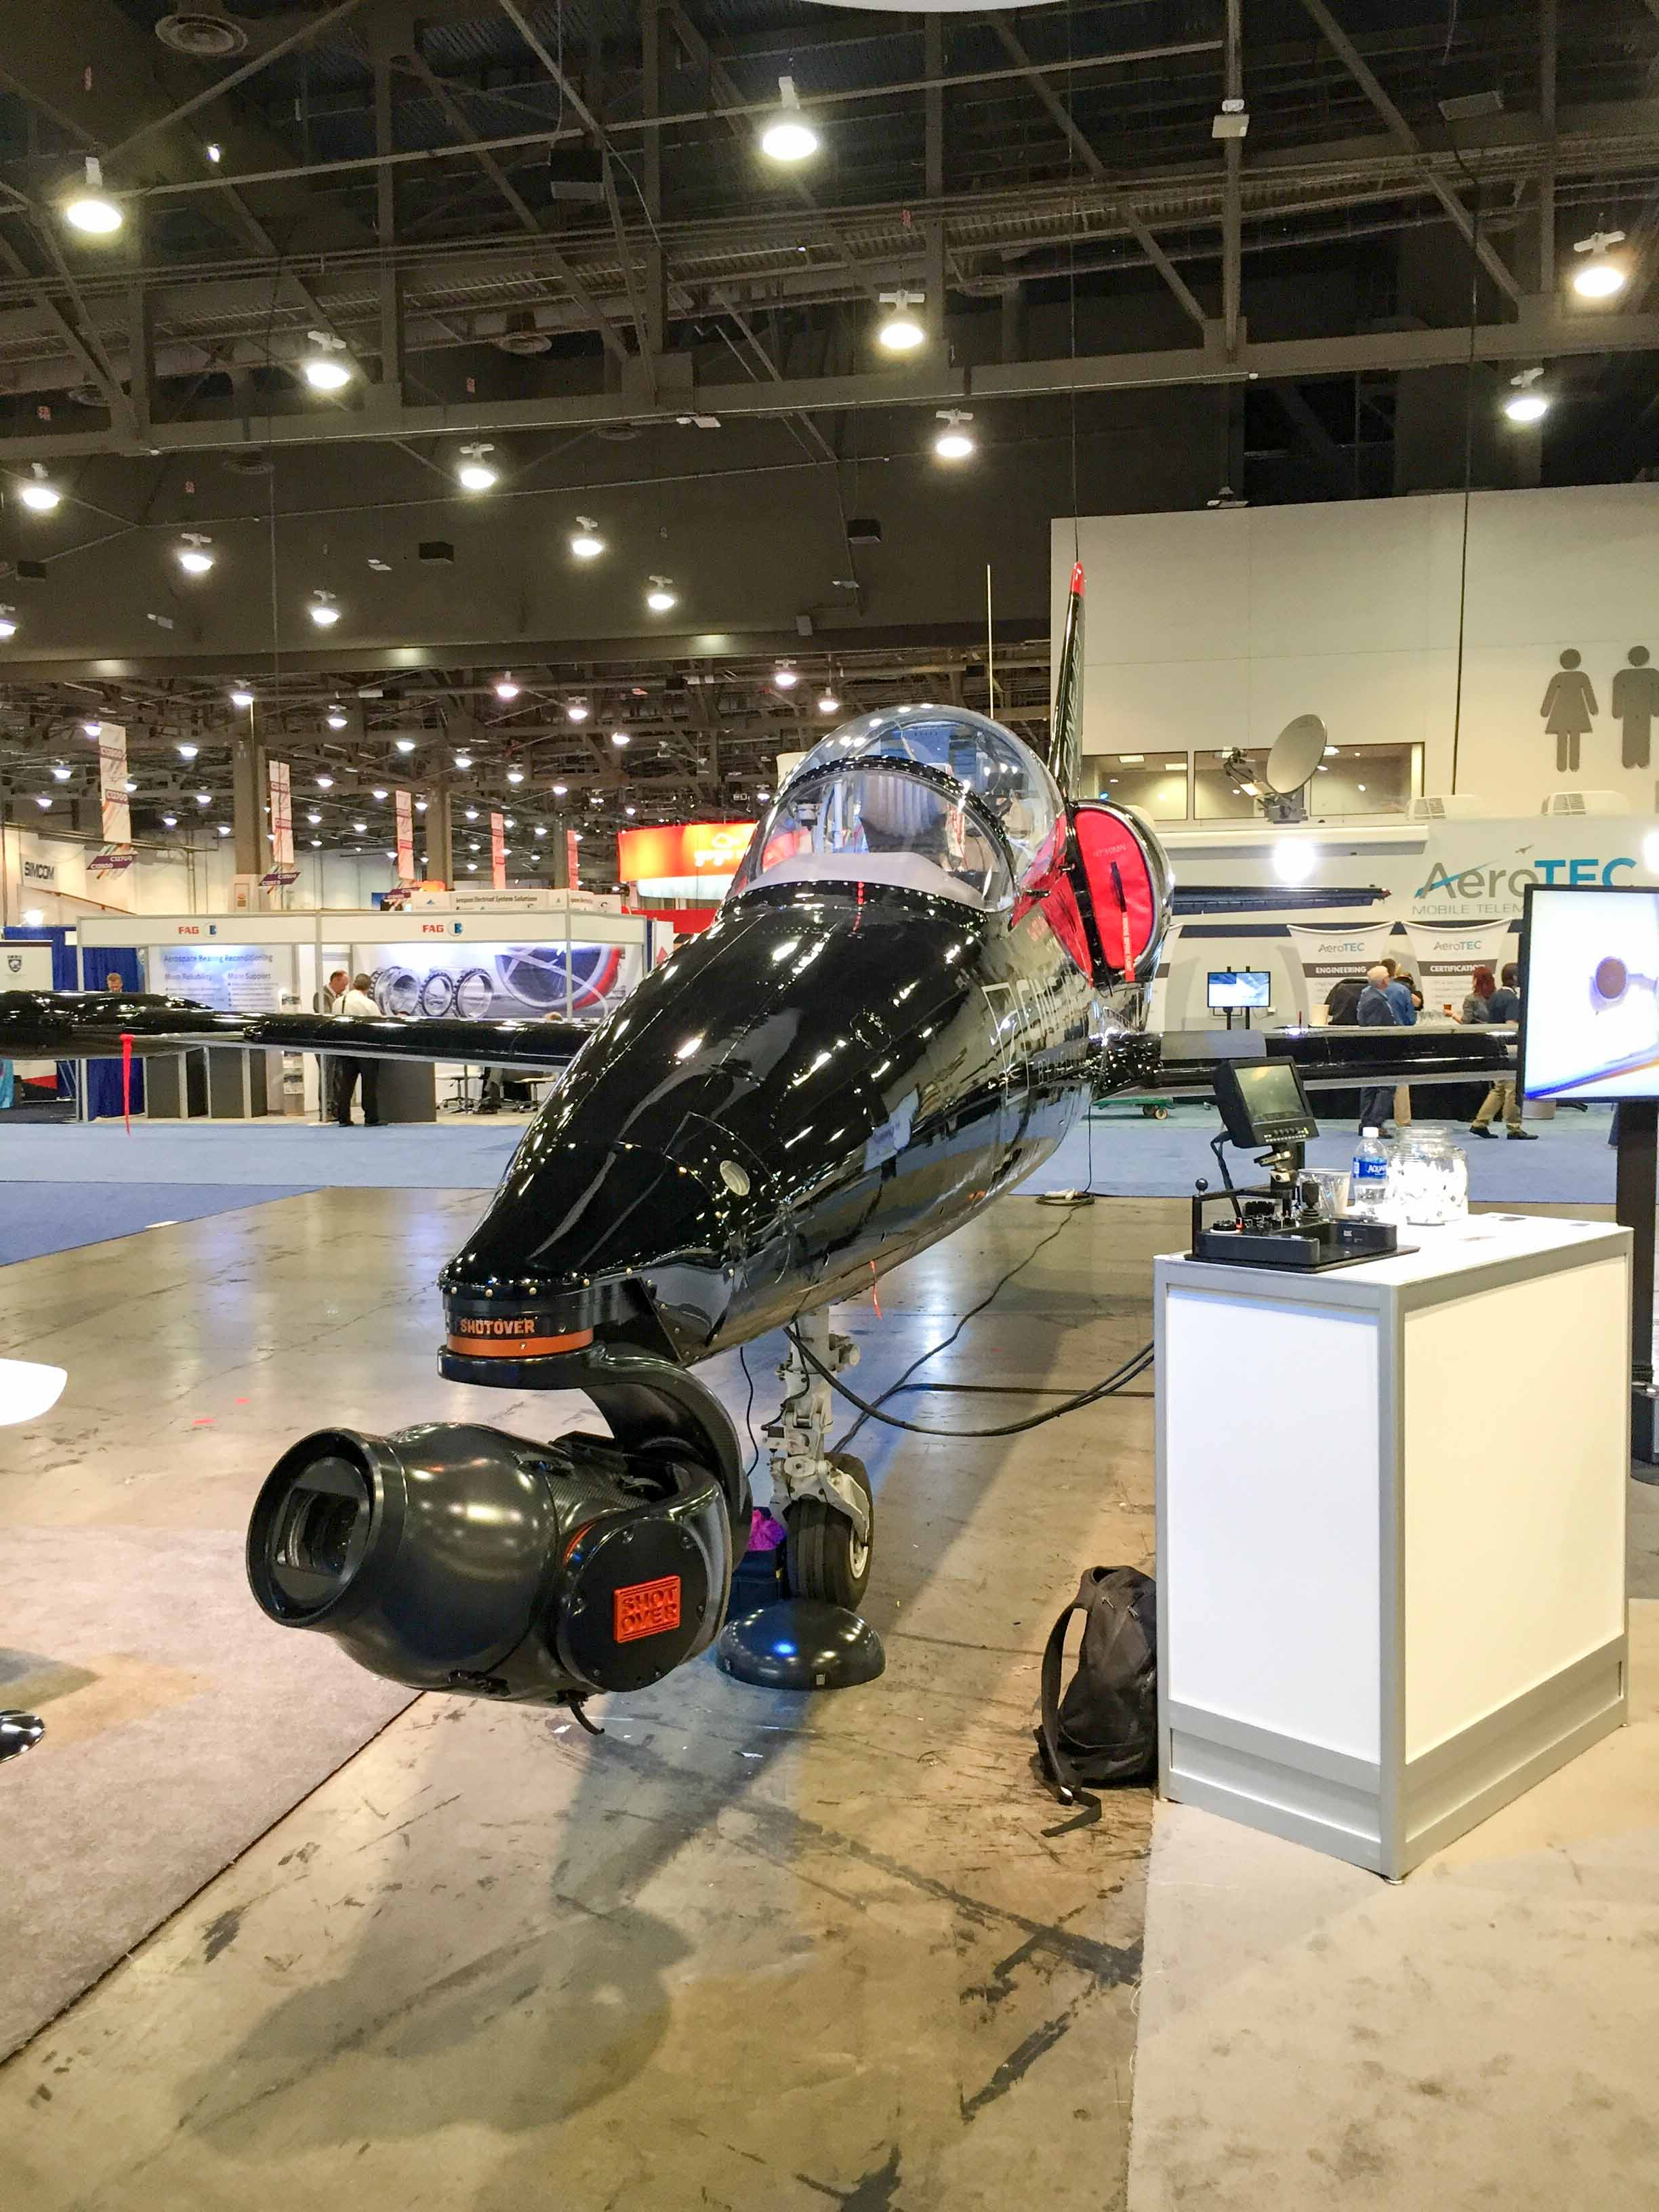 awesome-jet-mounted-camera-and-gimbal